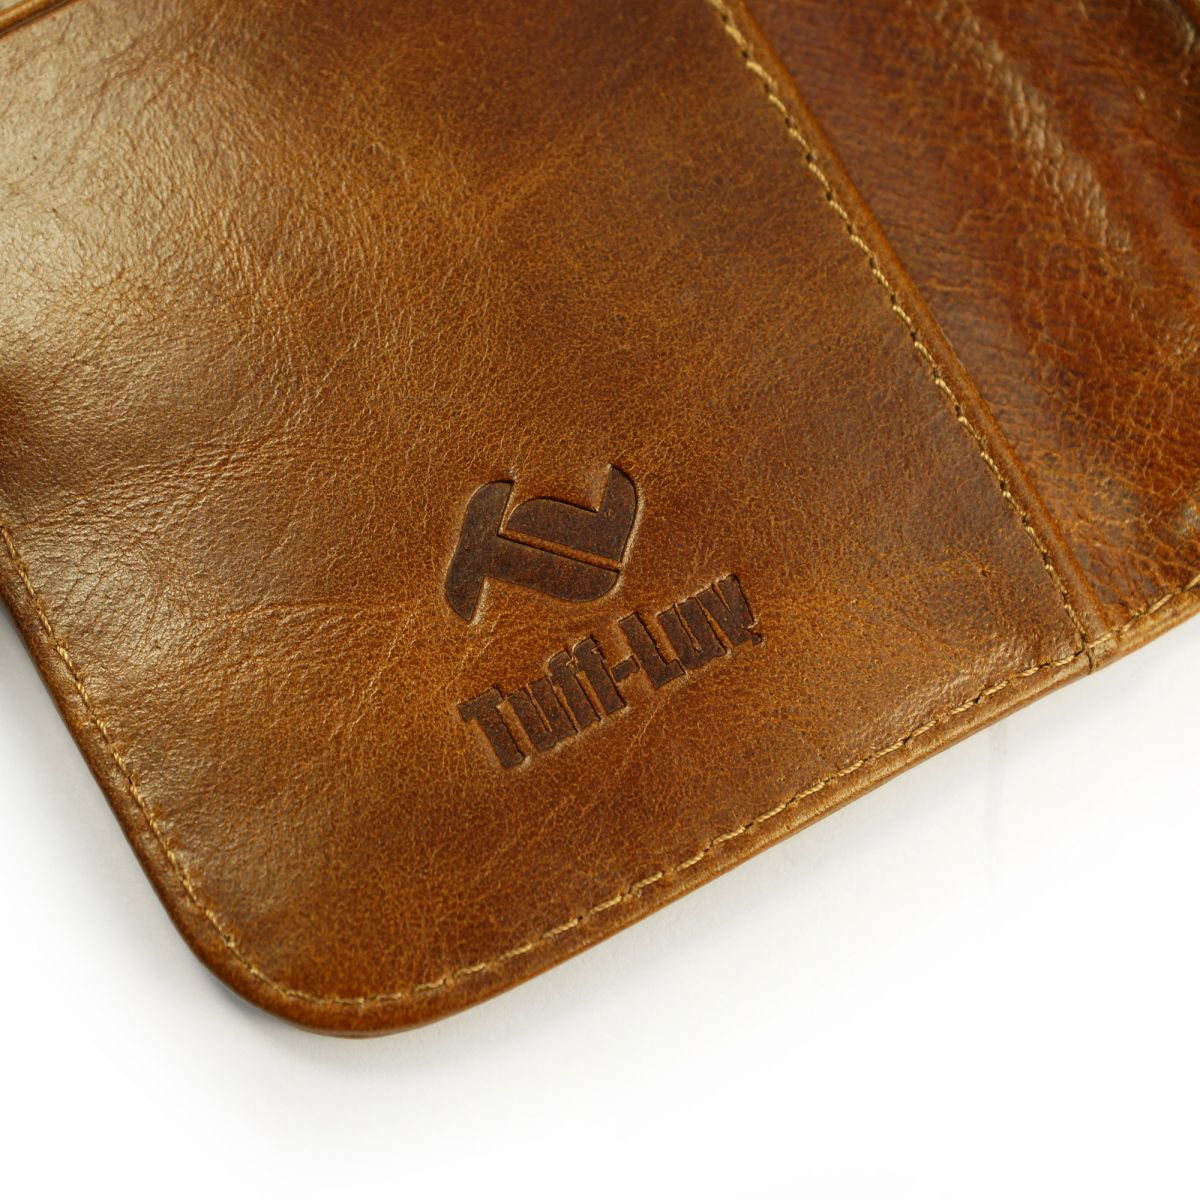 Tuff Luv Vintage Brown Wallet Windows Phone 8x / HTC Desire SV Sony